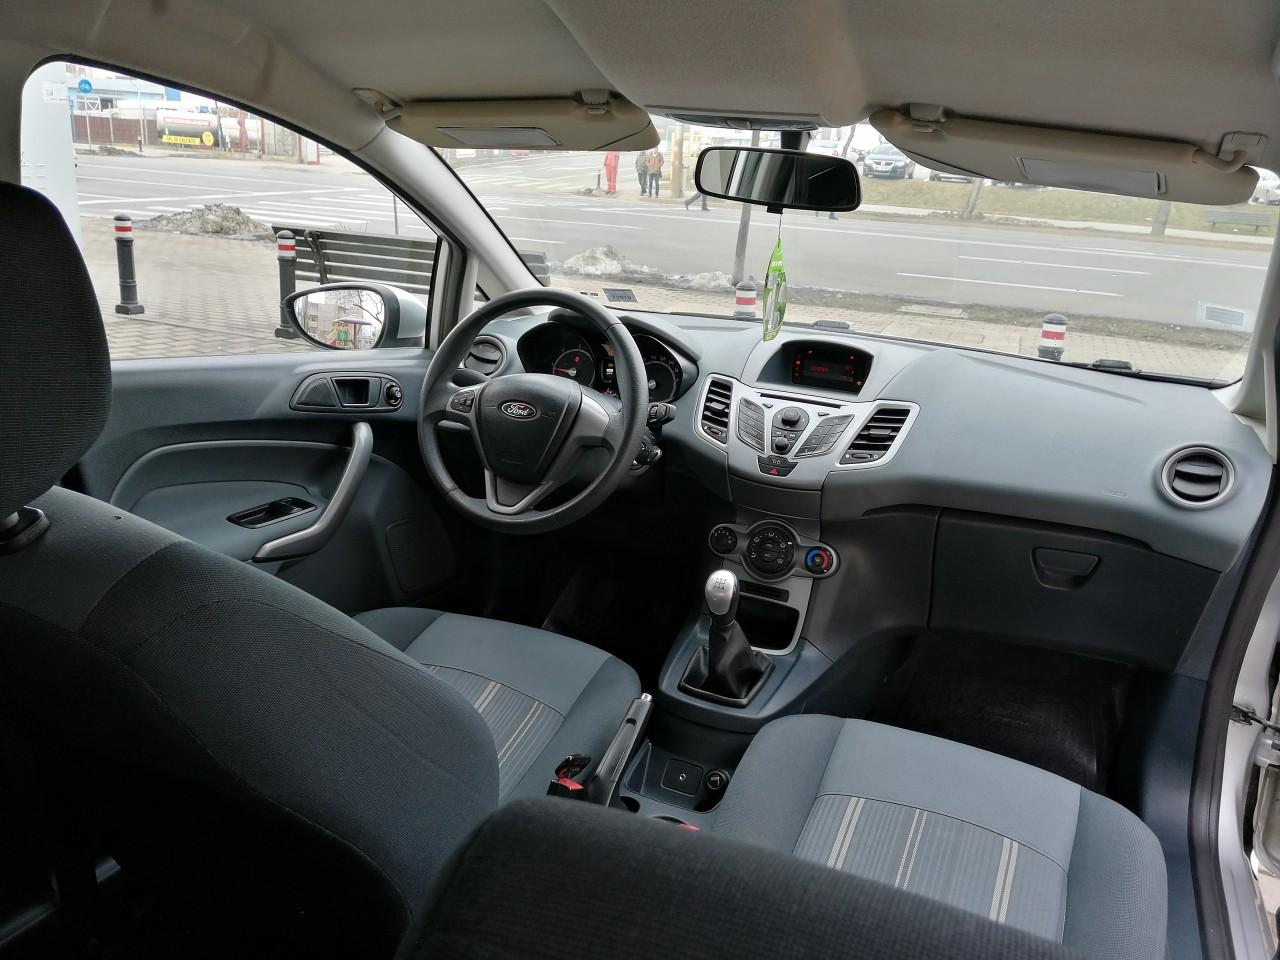 Ford Fiesta 1.4 TDCI 2009